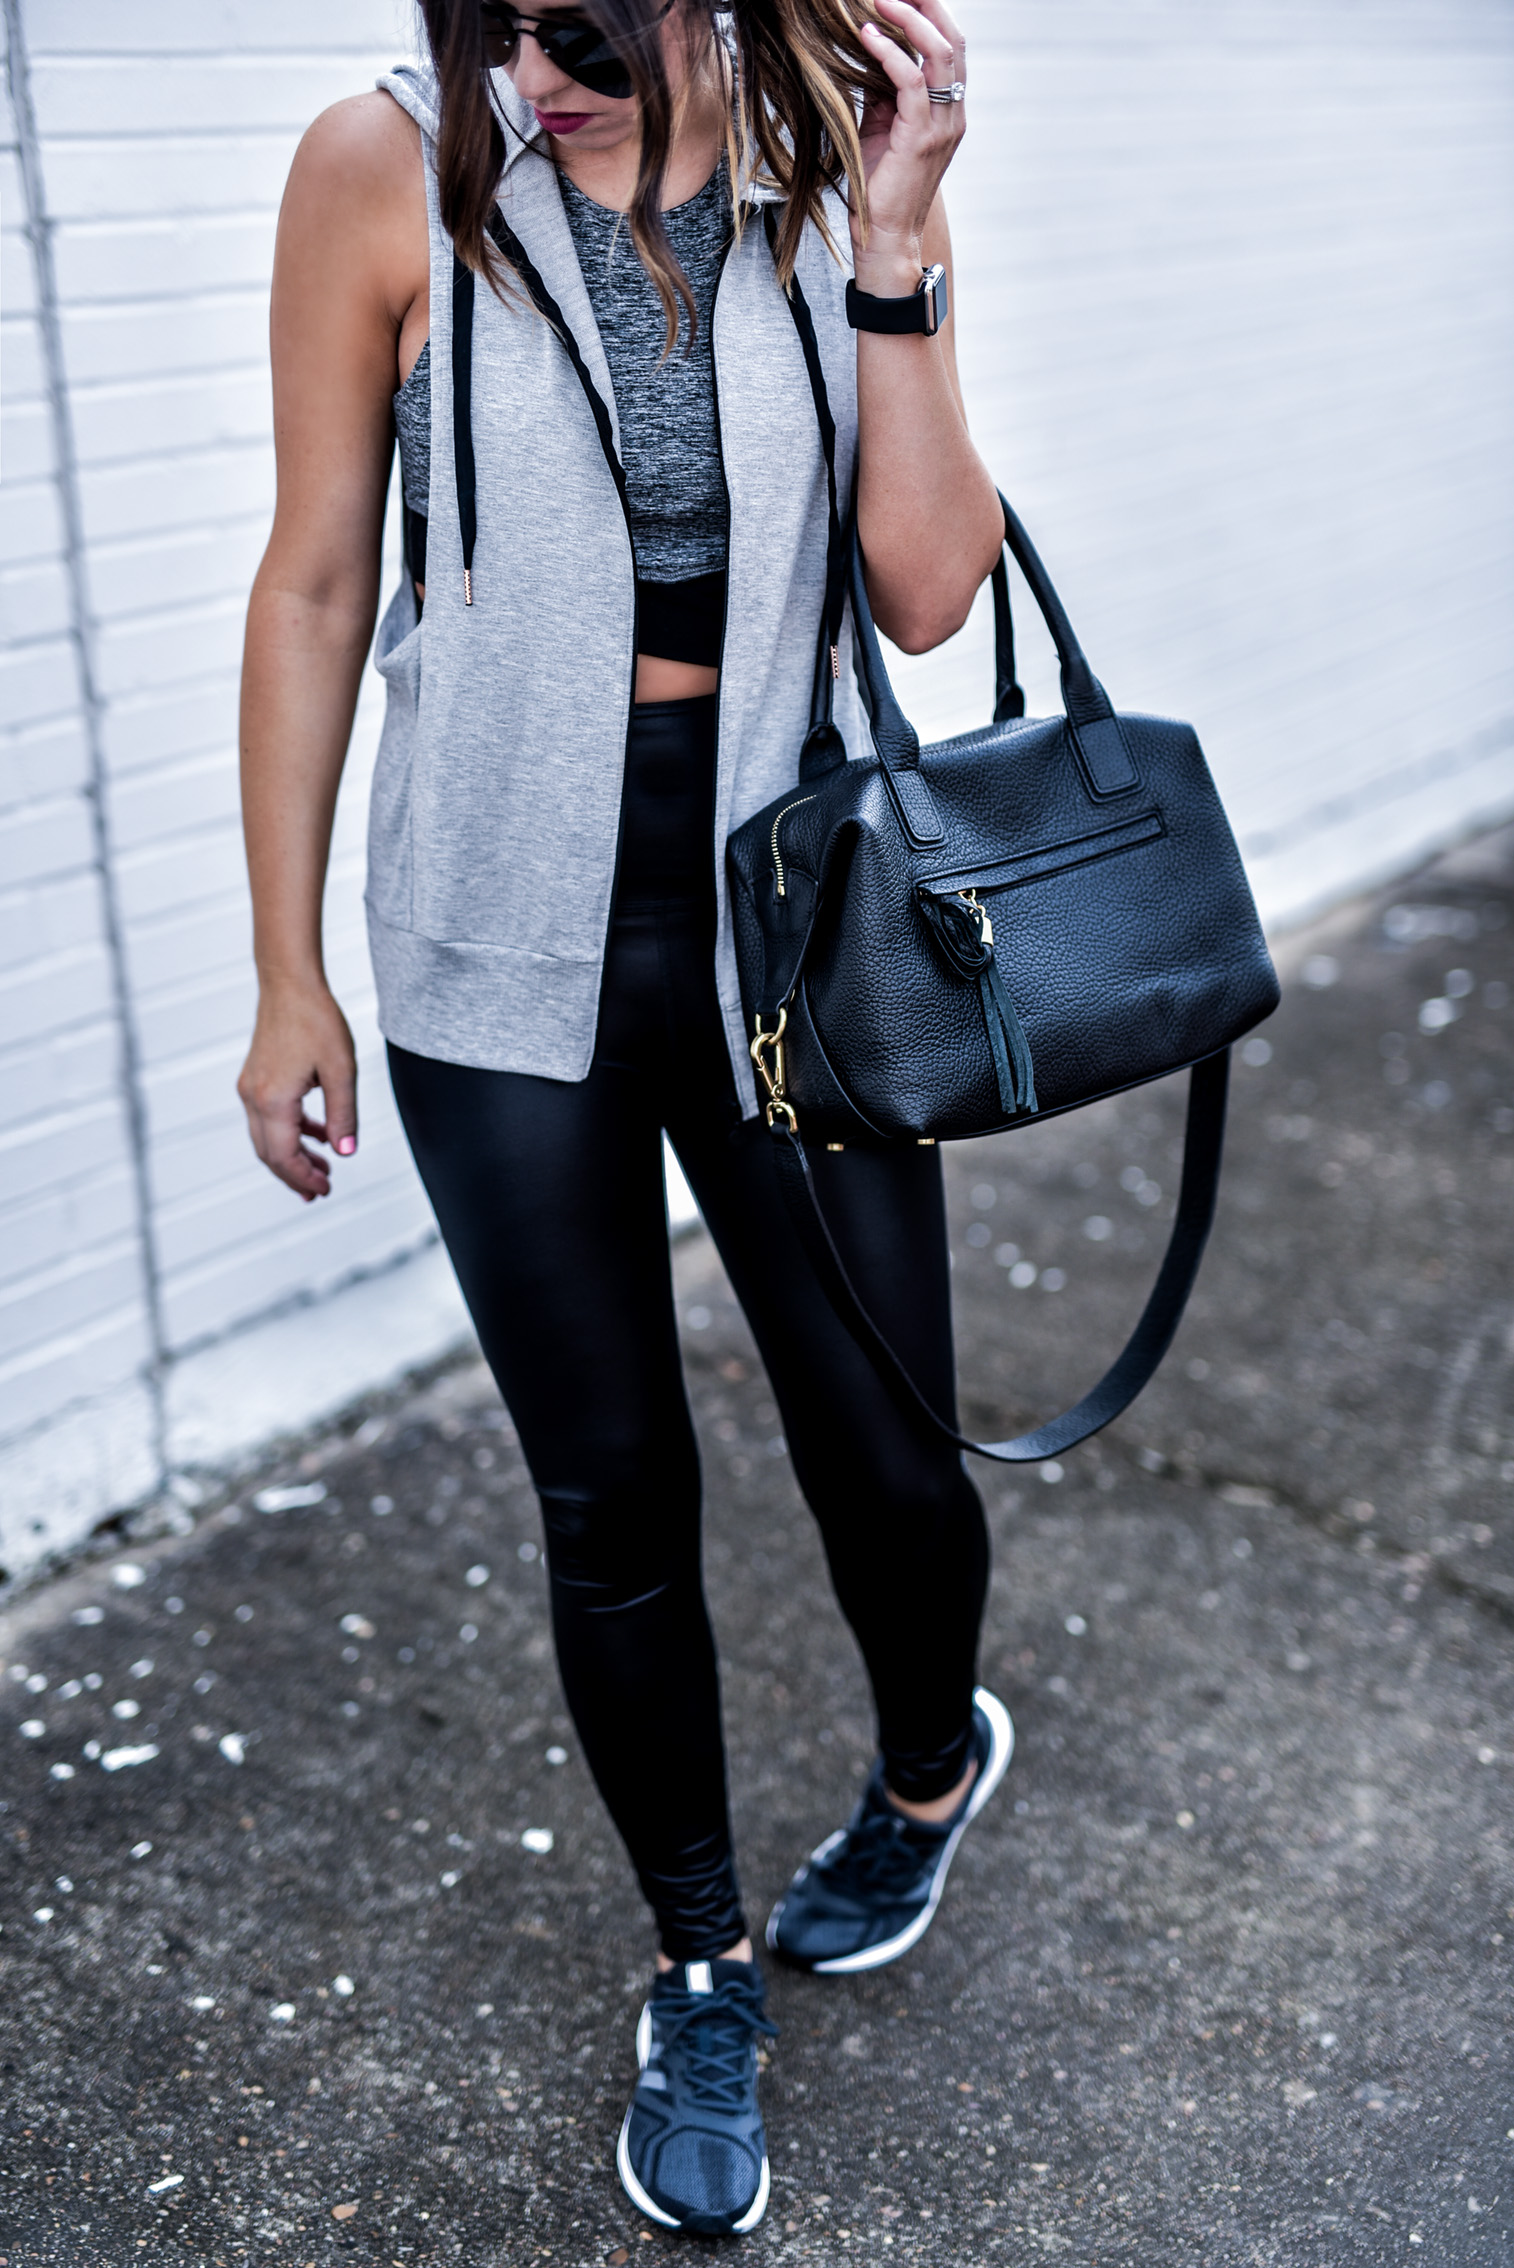 Houston fashion and lifestyle blogger Tiffany Jais wearing beyond yoga activewear, click to read more | Beyond yoga vest, high gloss leggings, beyond yoga sports bra |